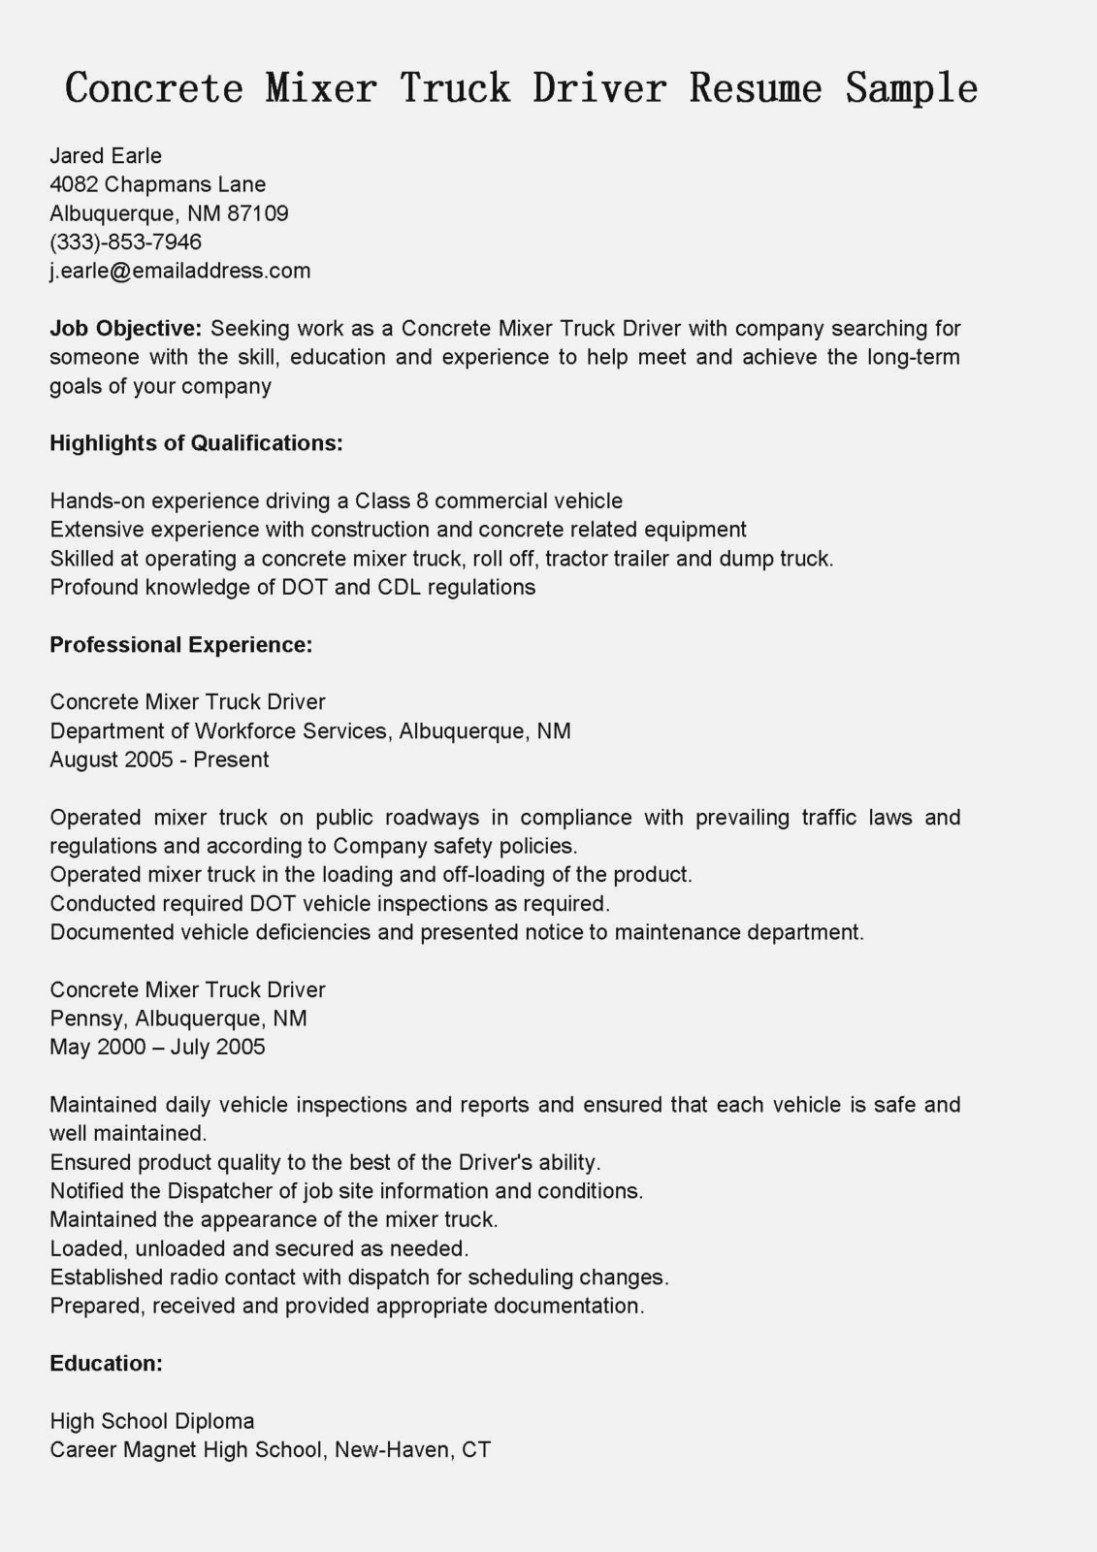 Cdl Truck Driver Job Description For Resume Inspirational Truck Driver Job Description Best Image Truck Kusaboshi